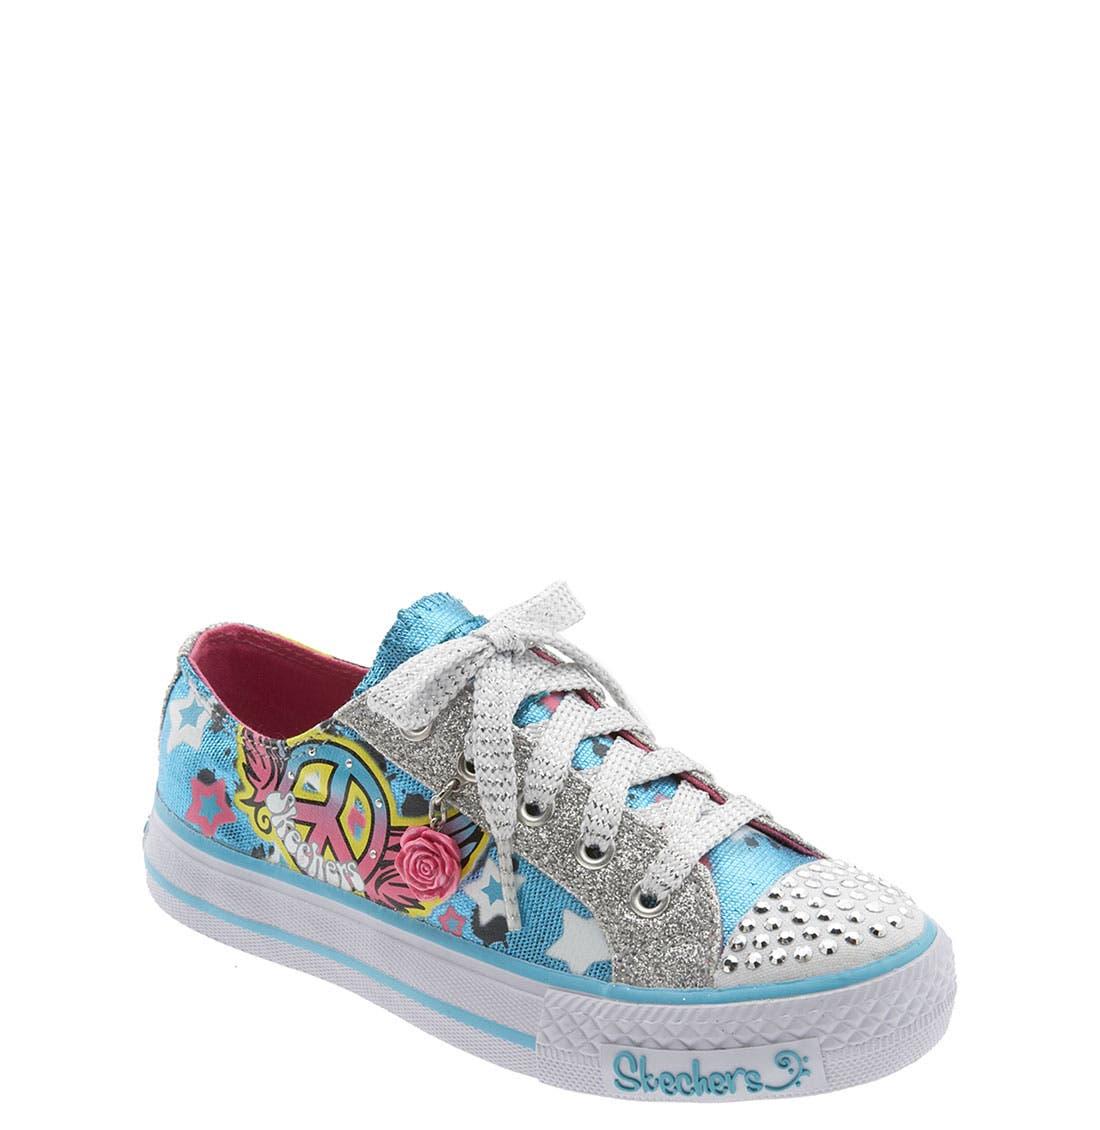 Main Image - SKECHERS 'Shuffles - Free Fall' Sneaker (Toddler, Little Kid & Big Kid)